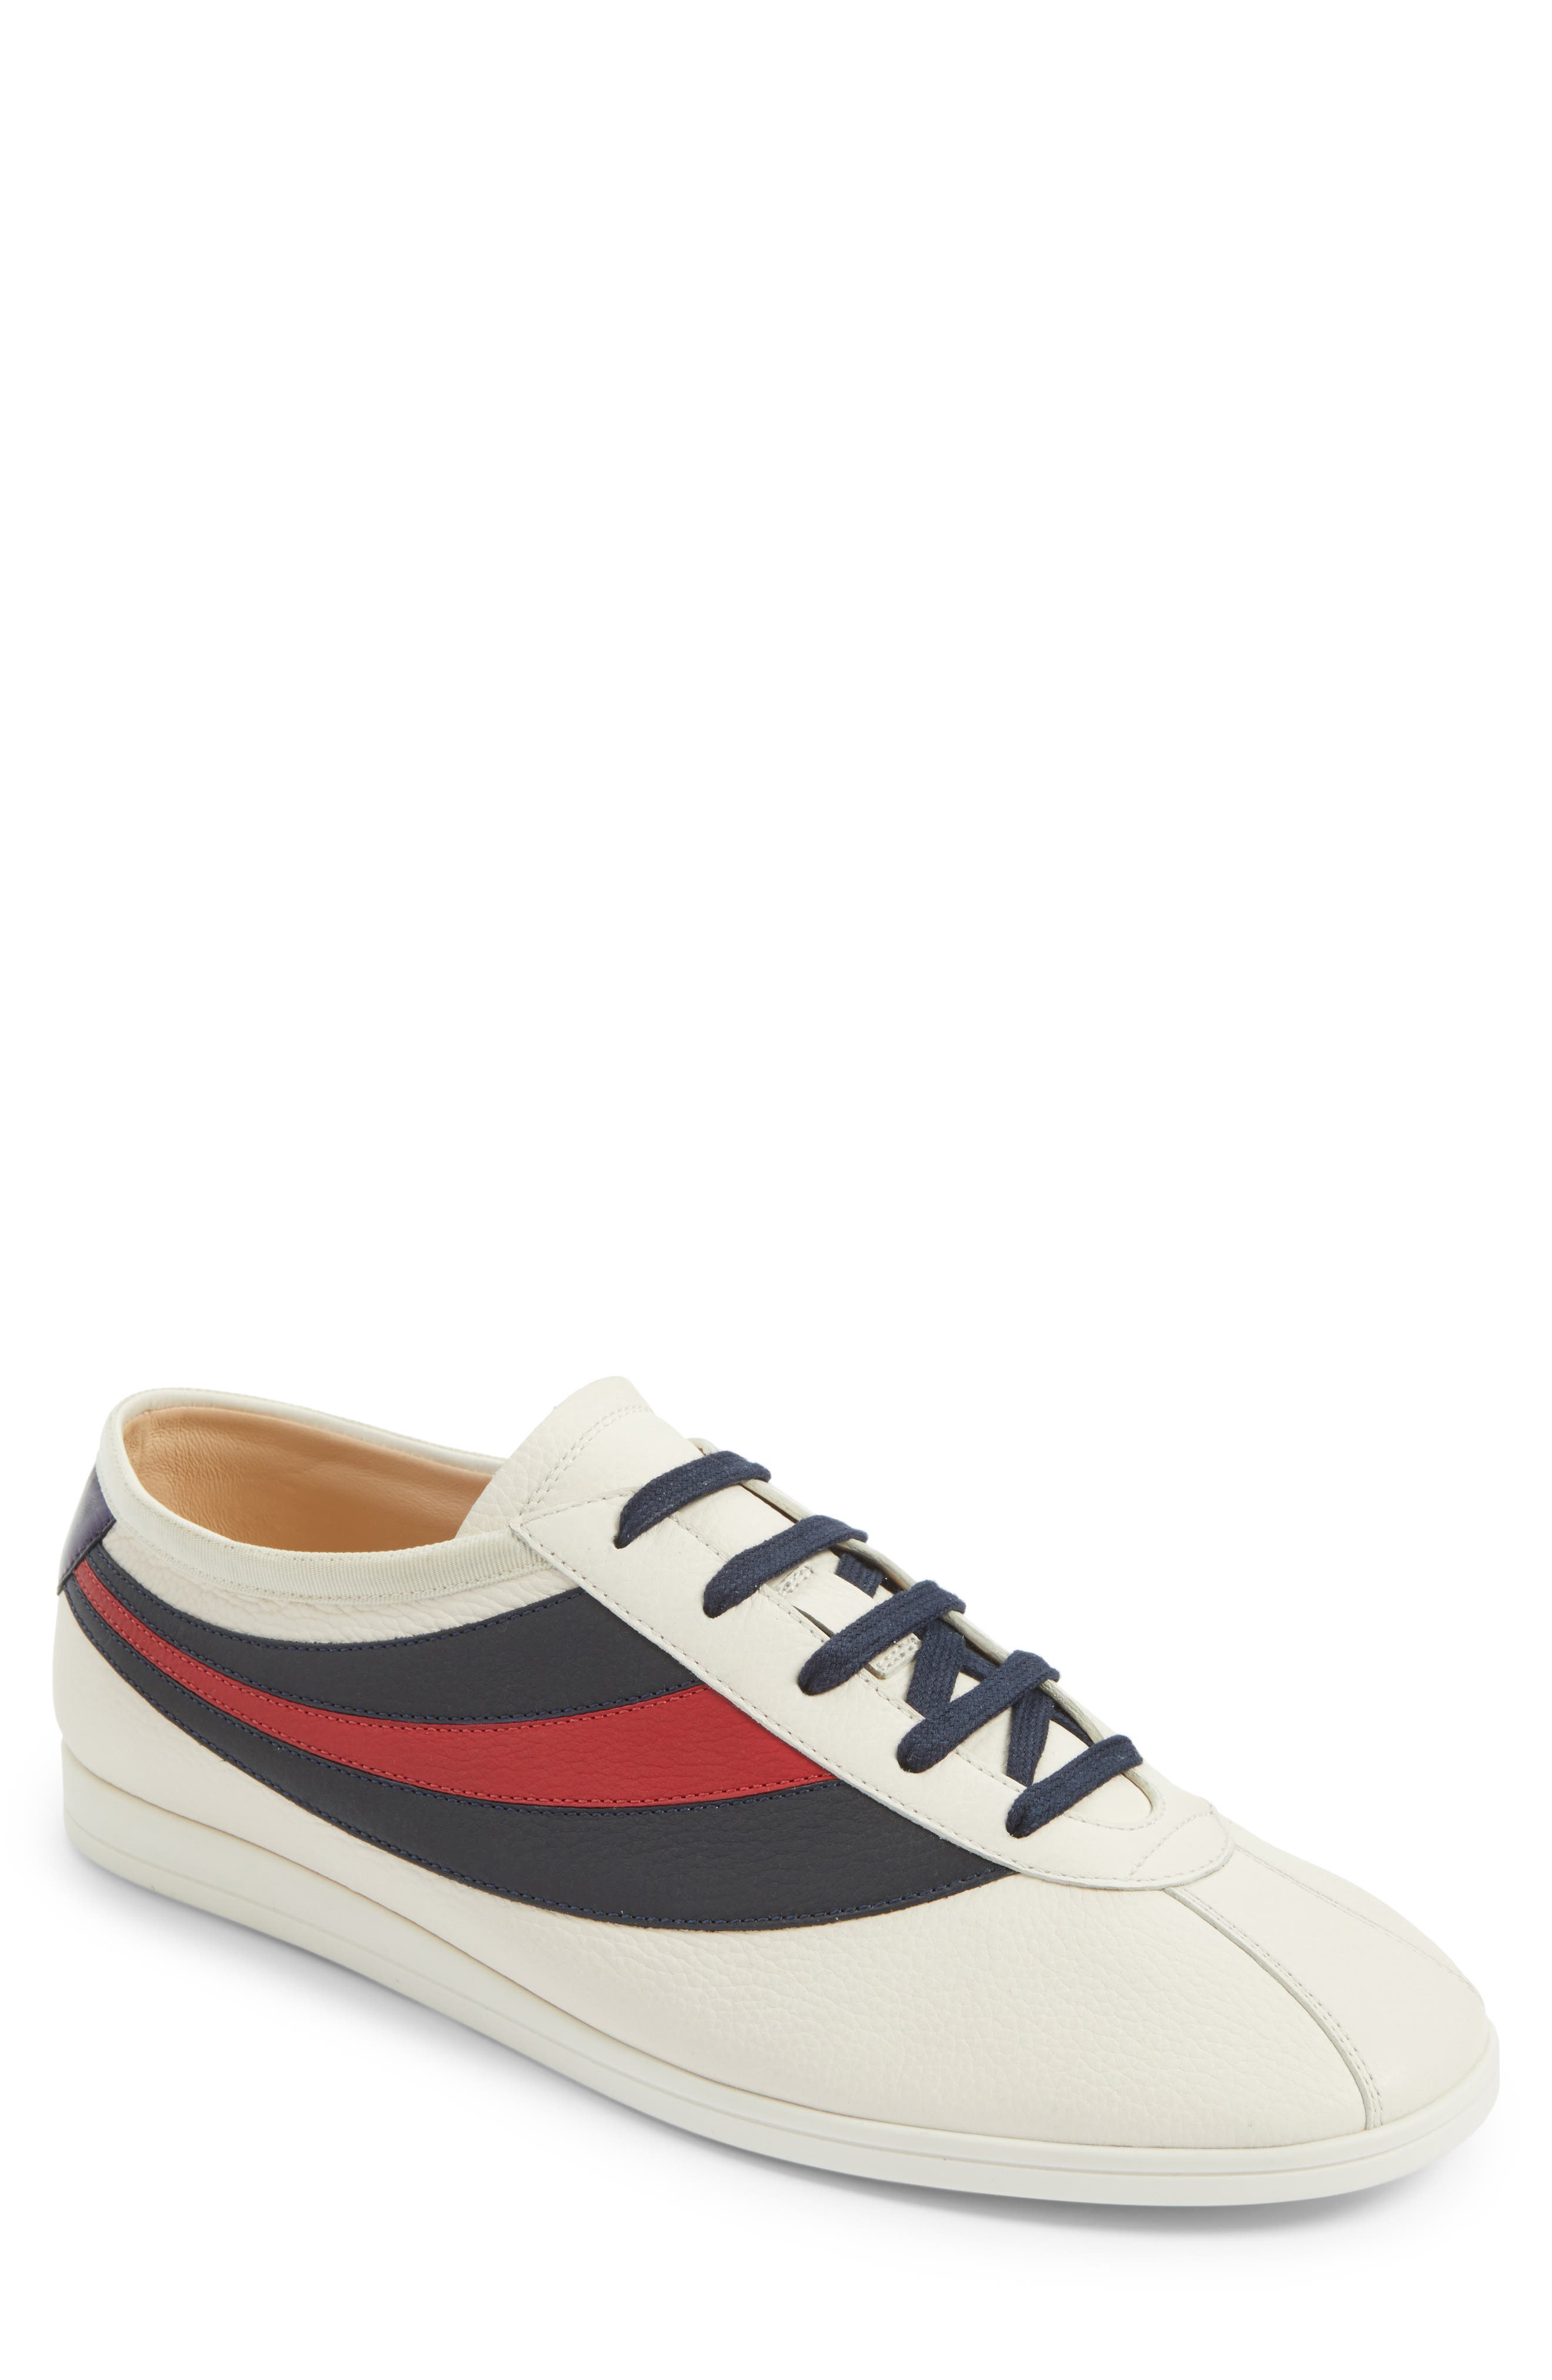 Falacer Sneaker,                         Main,                         color, 106